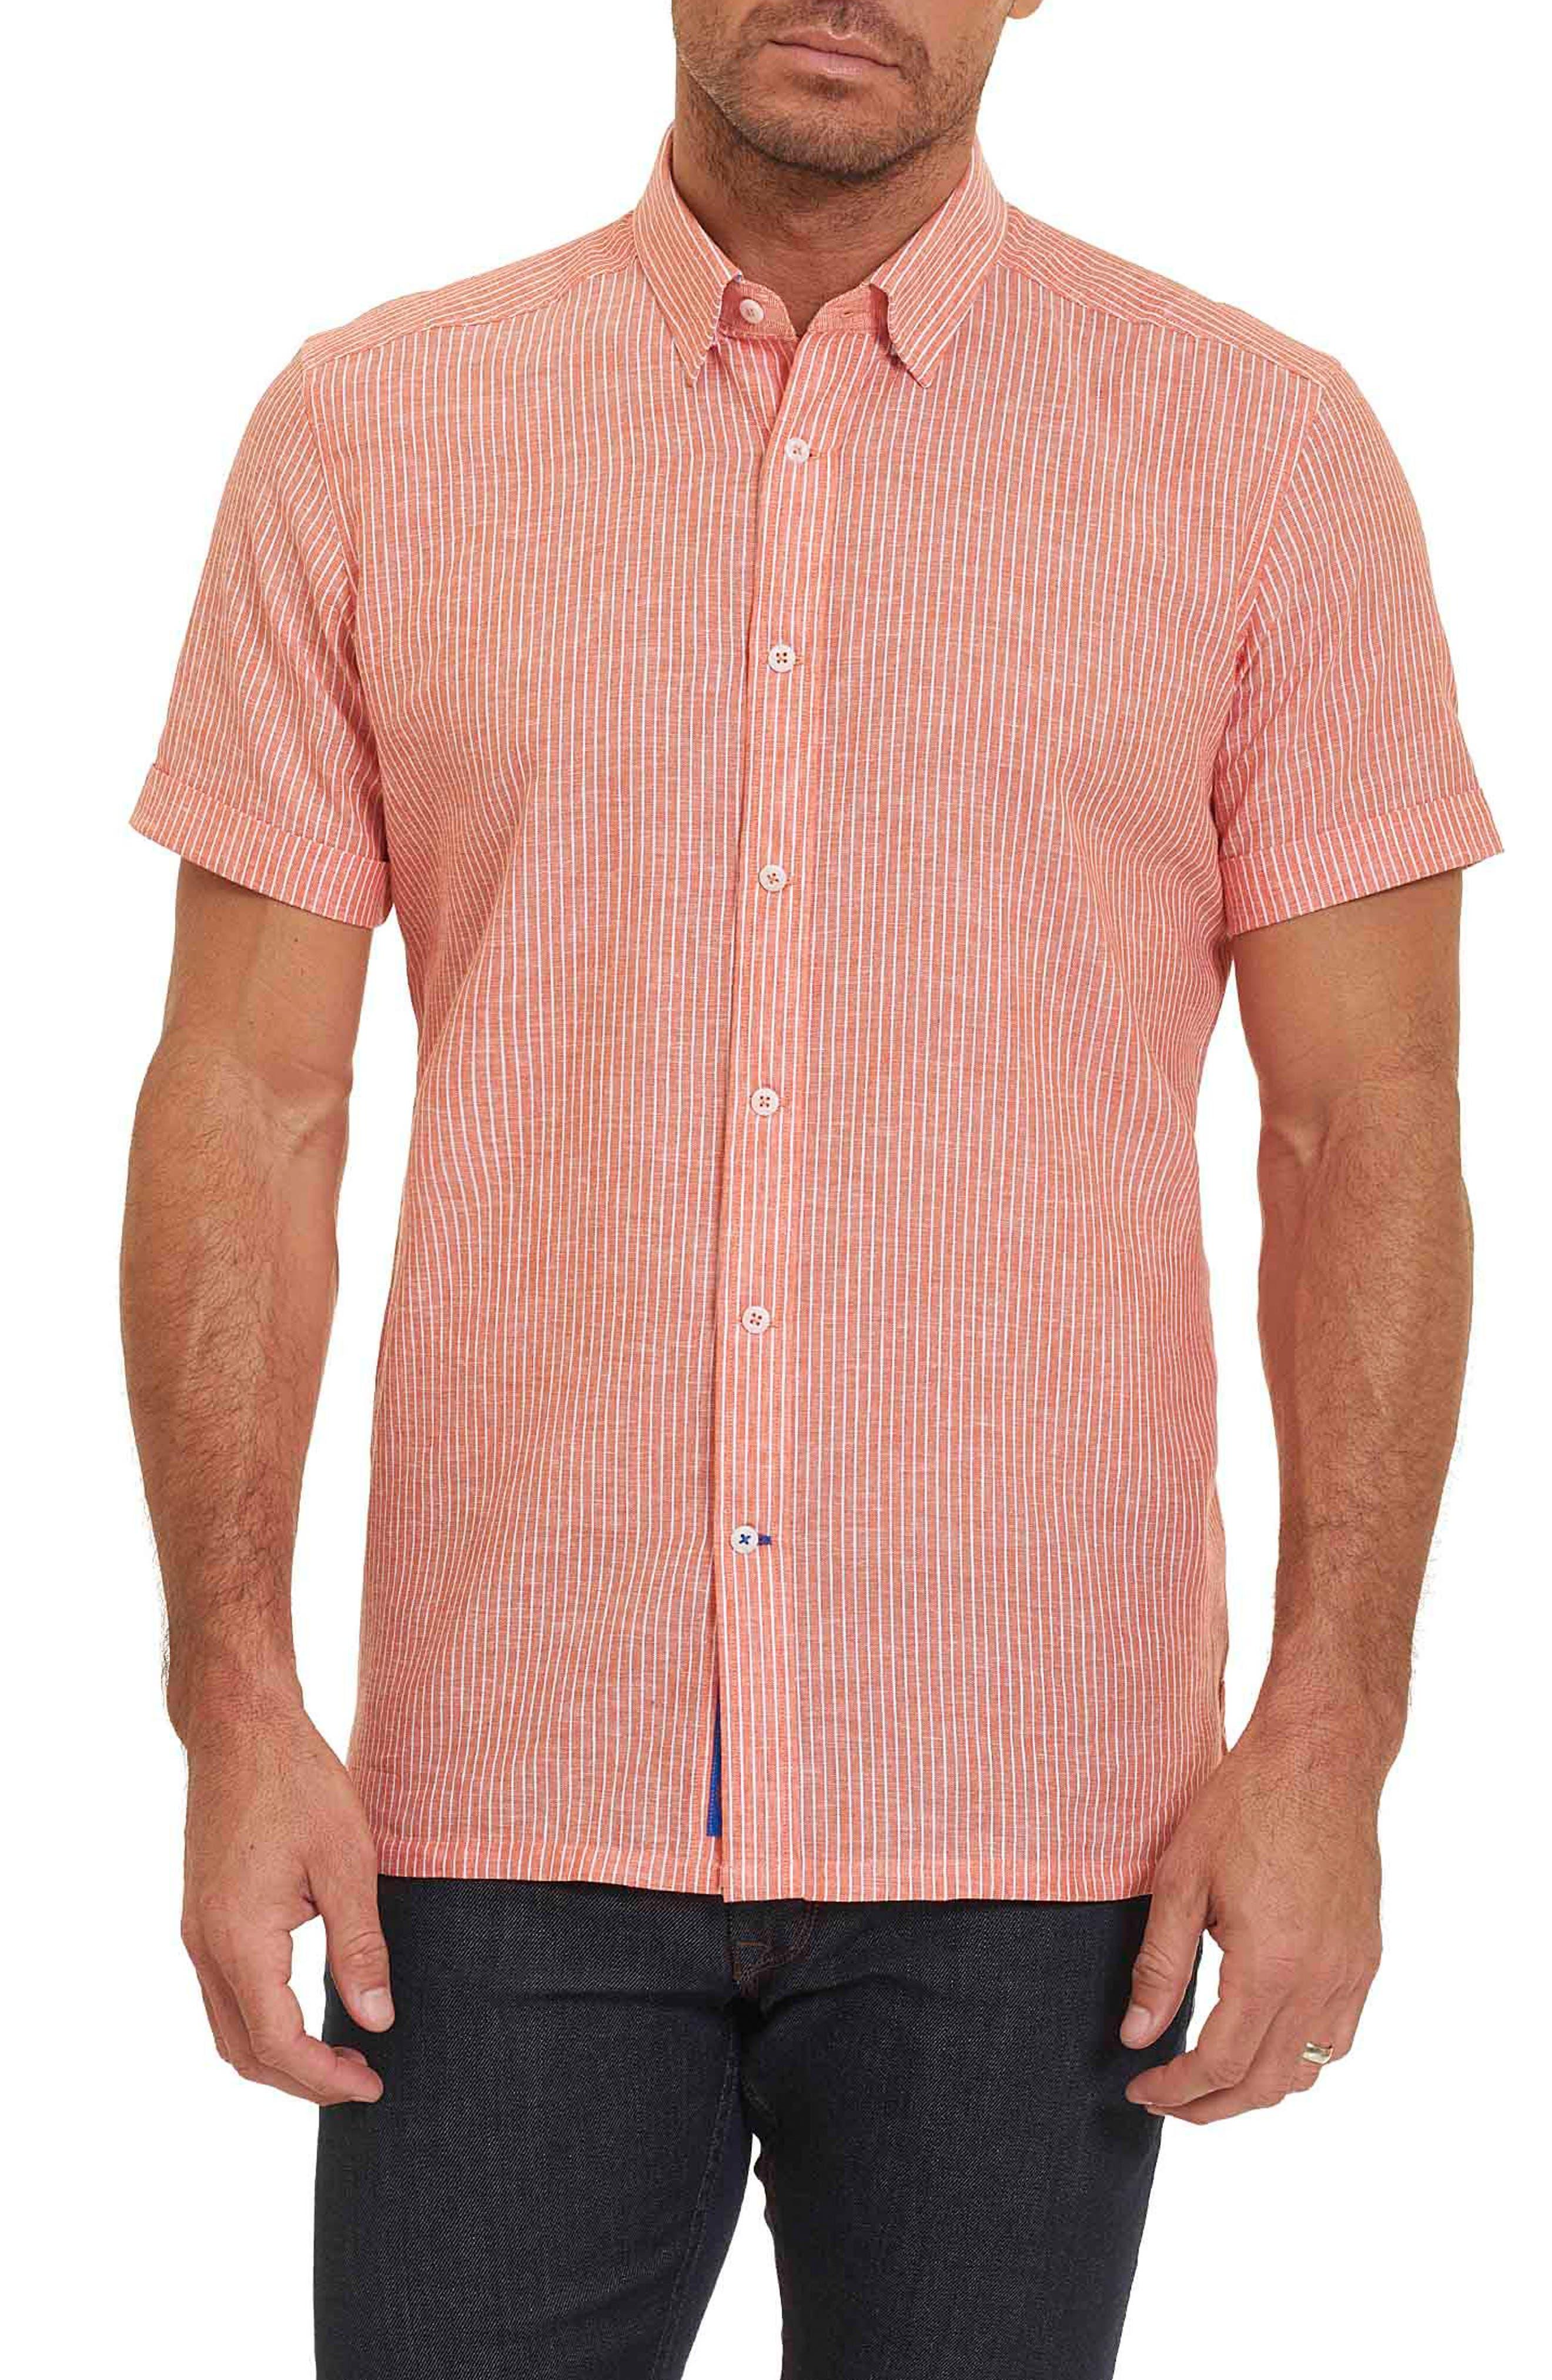 Main Image - Robert Graham Tailored Fit Stripe Short Sleeve Sport Shirt